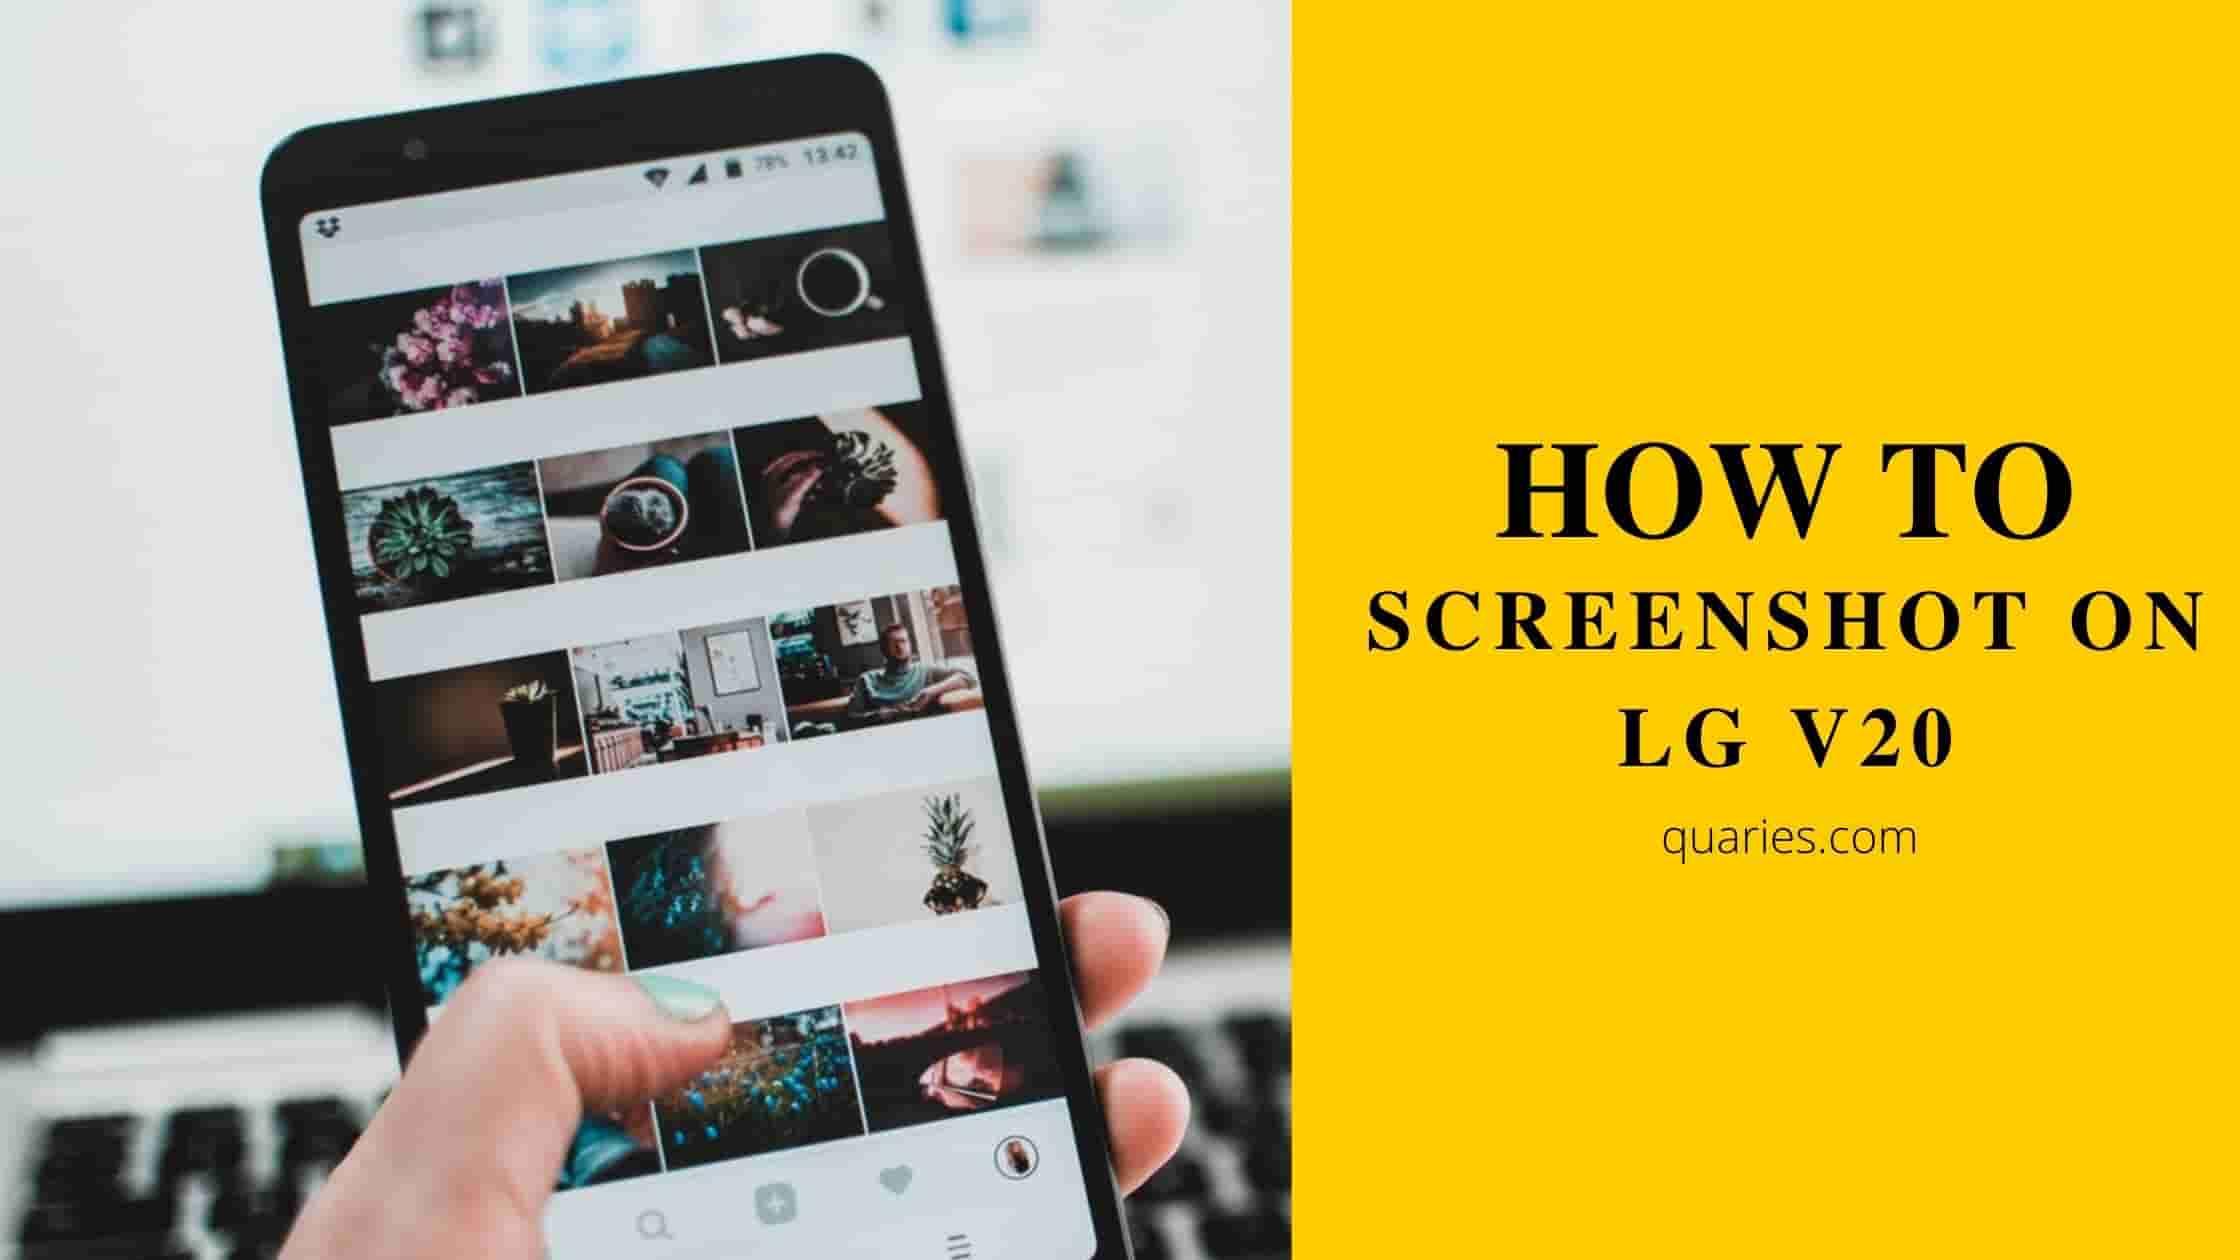 How To Screenshot On LG V20 Smartphone?